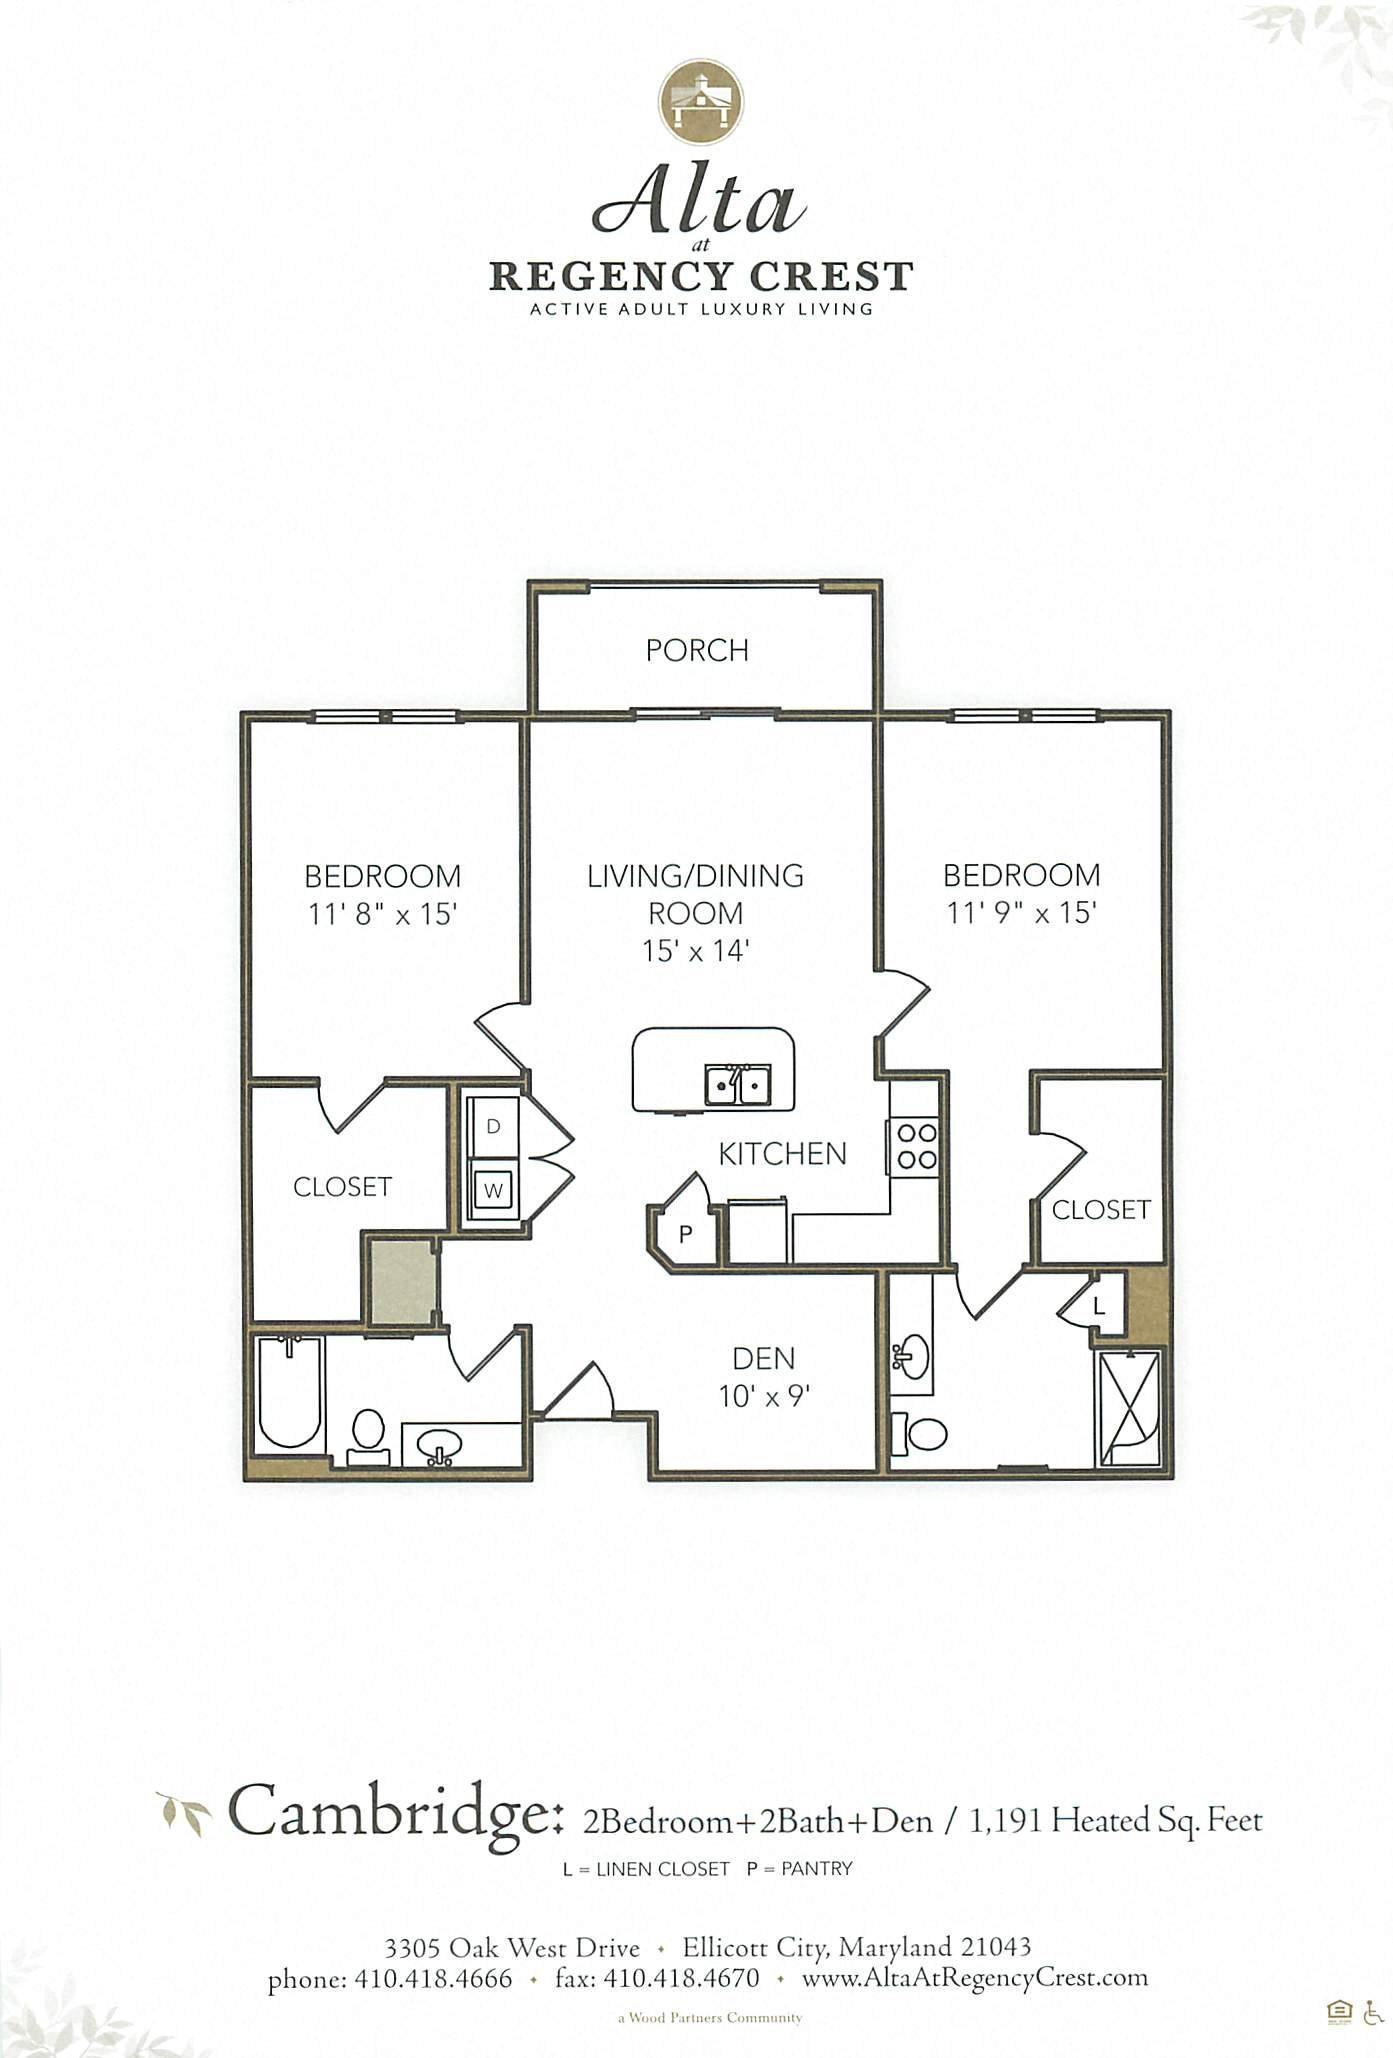 2 Bed/2 Bath Den-Cambridge Floor Plan 6